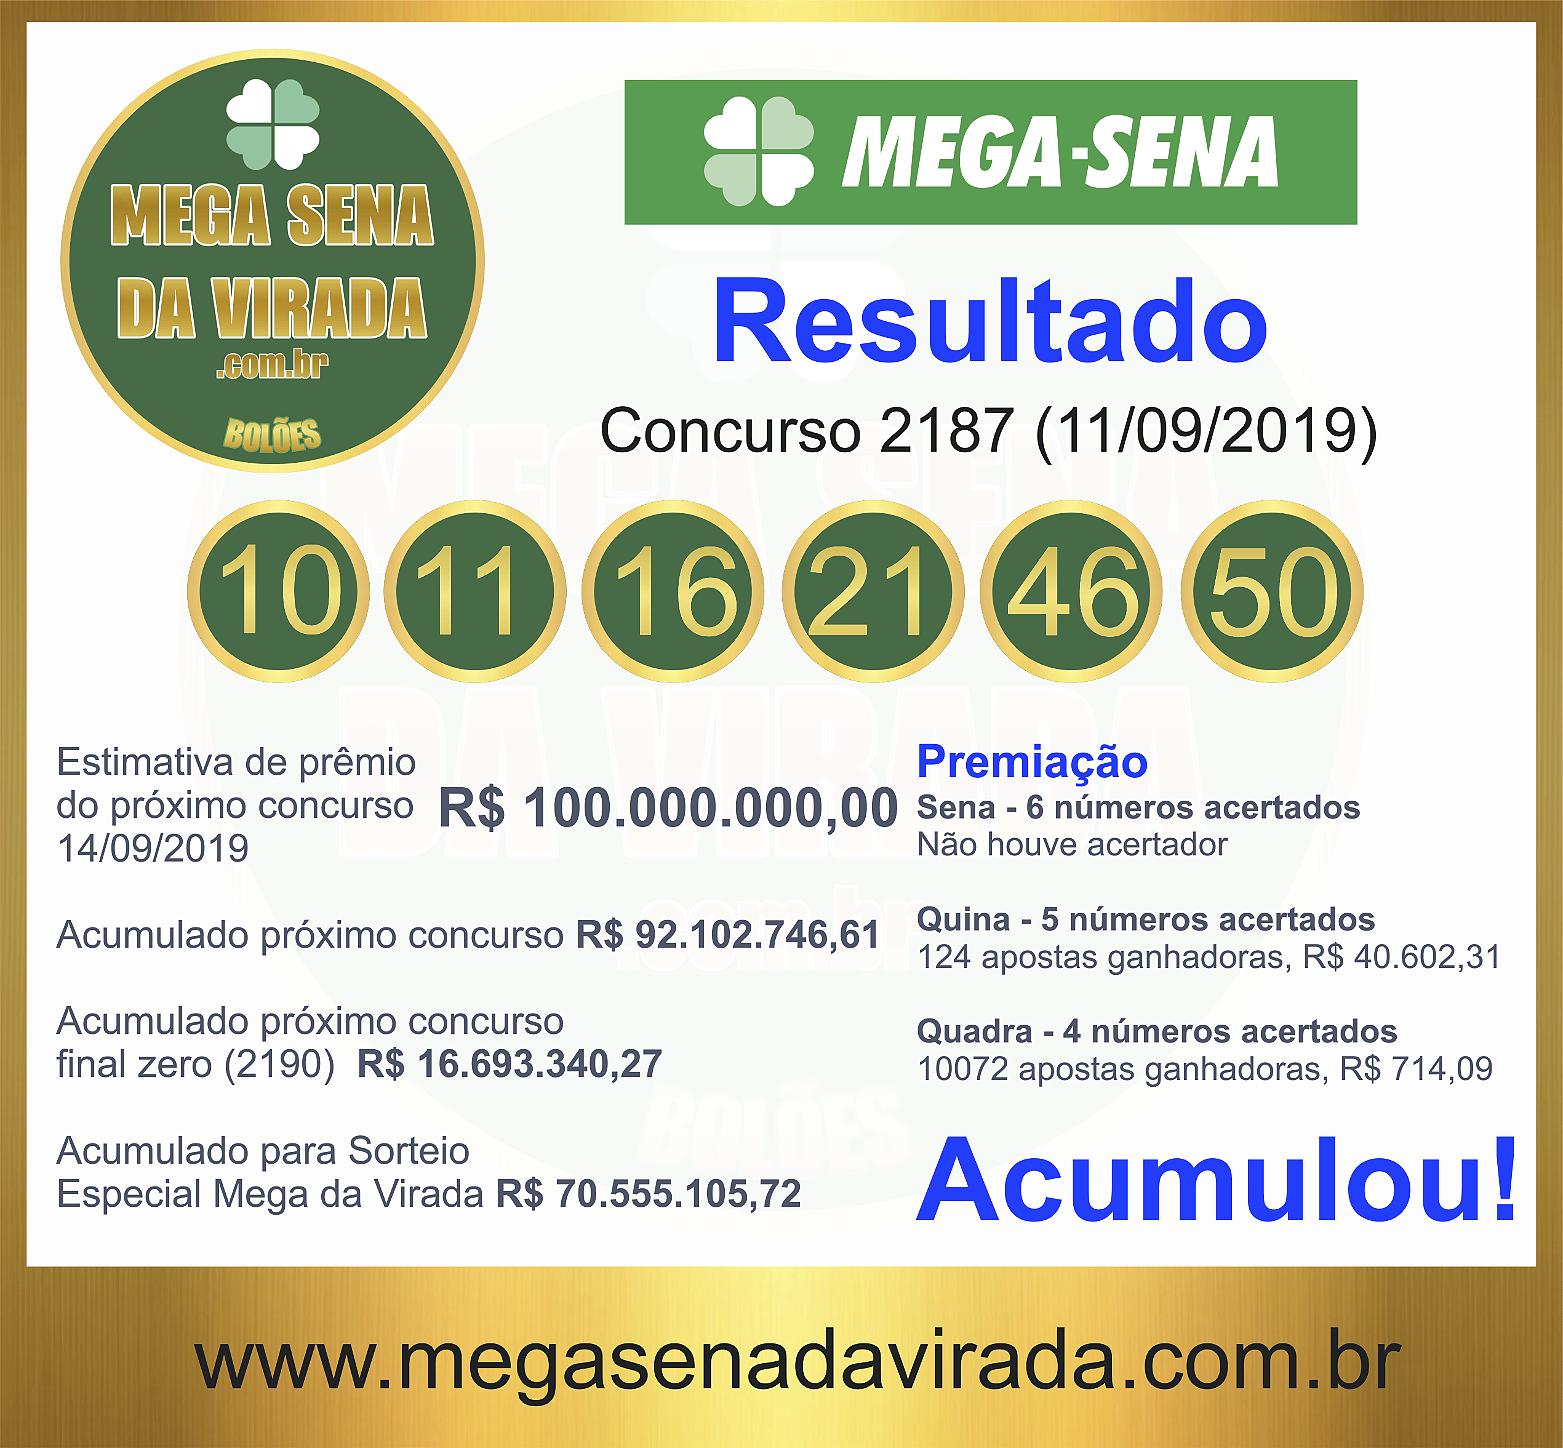 Mega Sena Concurso 2187 11/09/2019